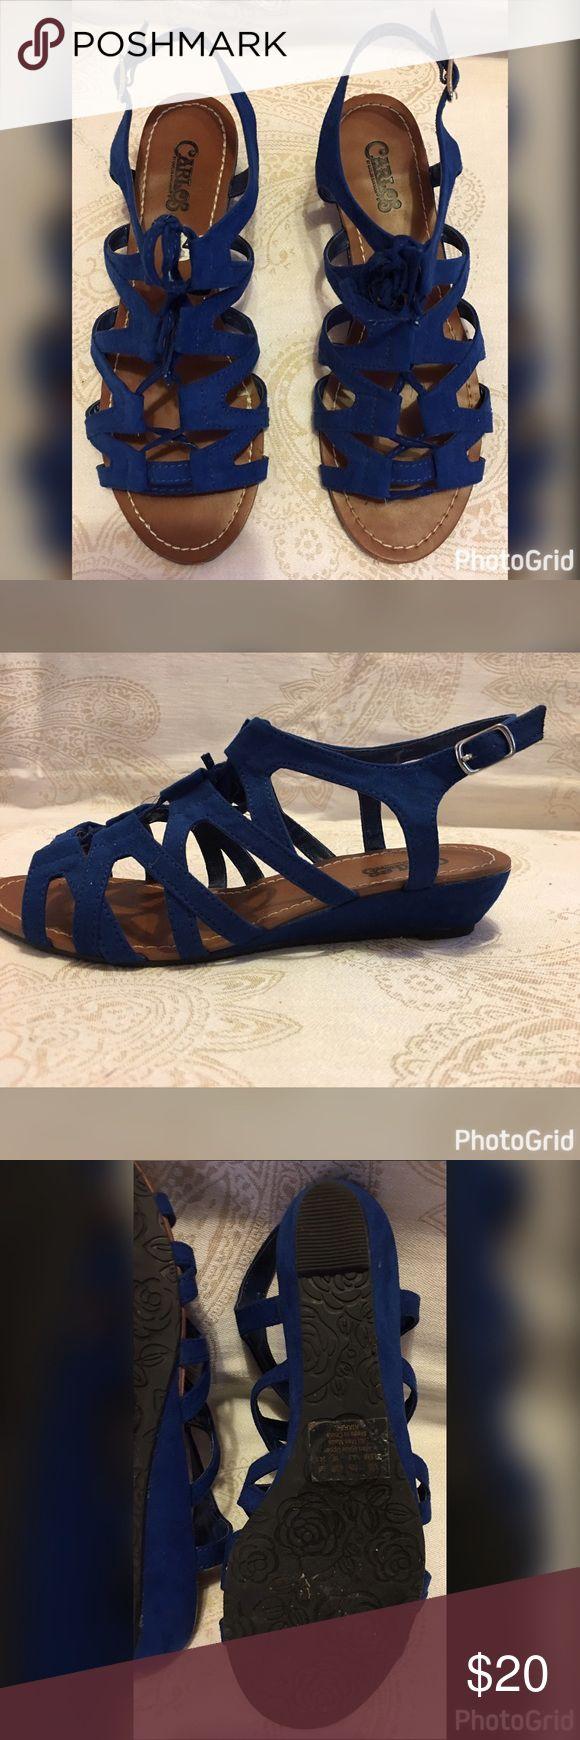 Carlos Santana Sandals Size 7 Cobolt Blue Carlos Santana Cobolt Blue Lace up Sandals Carlos Santana Shoes Sandals